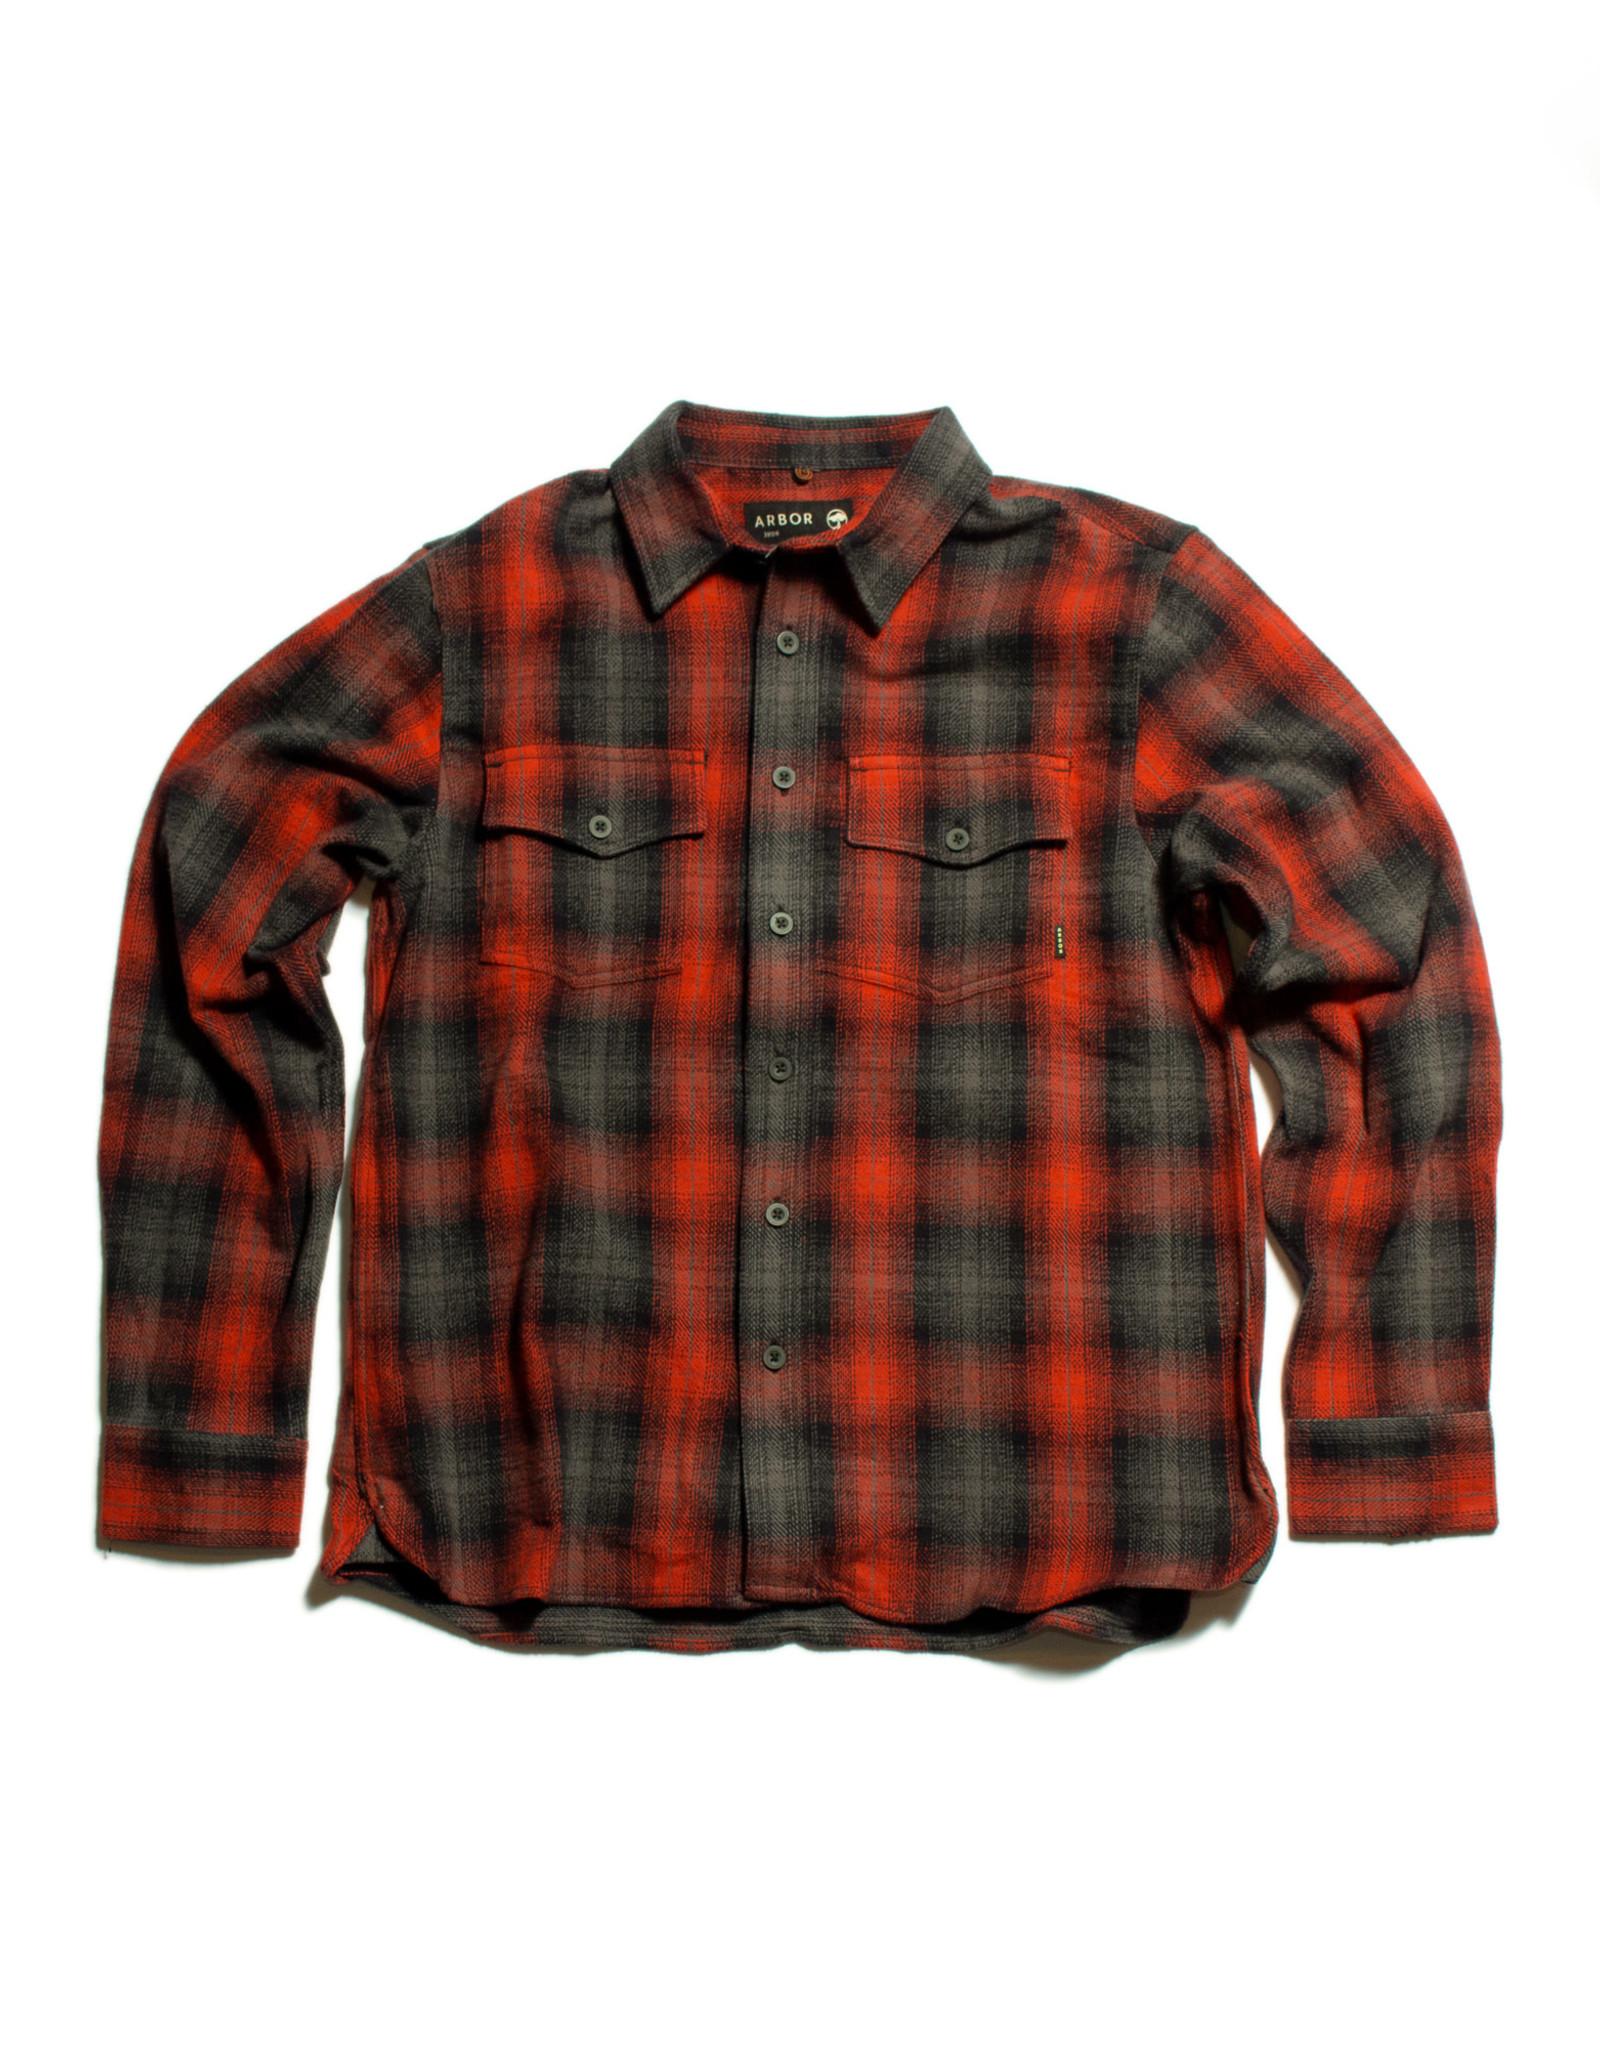 Arbor Good Times Shirt